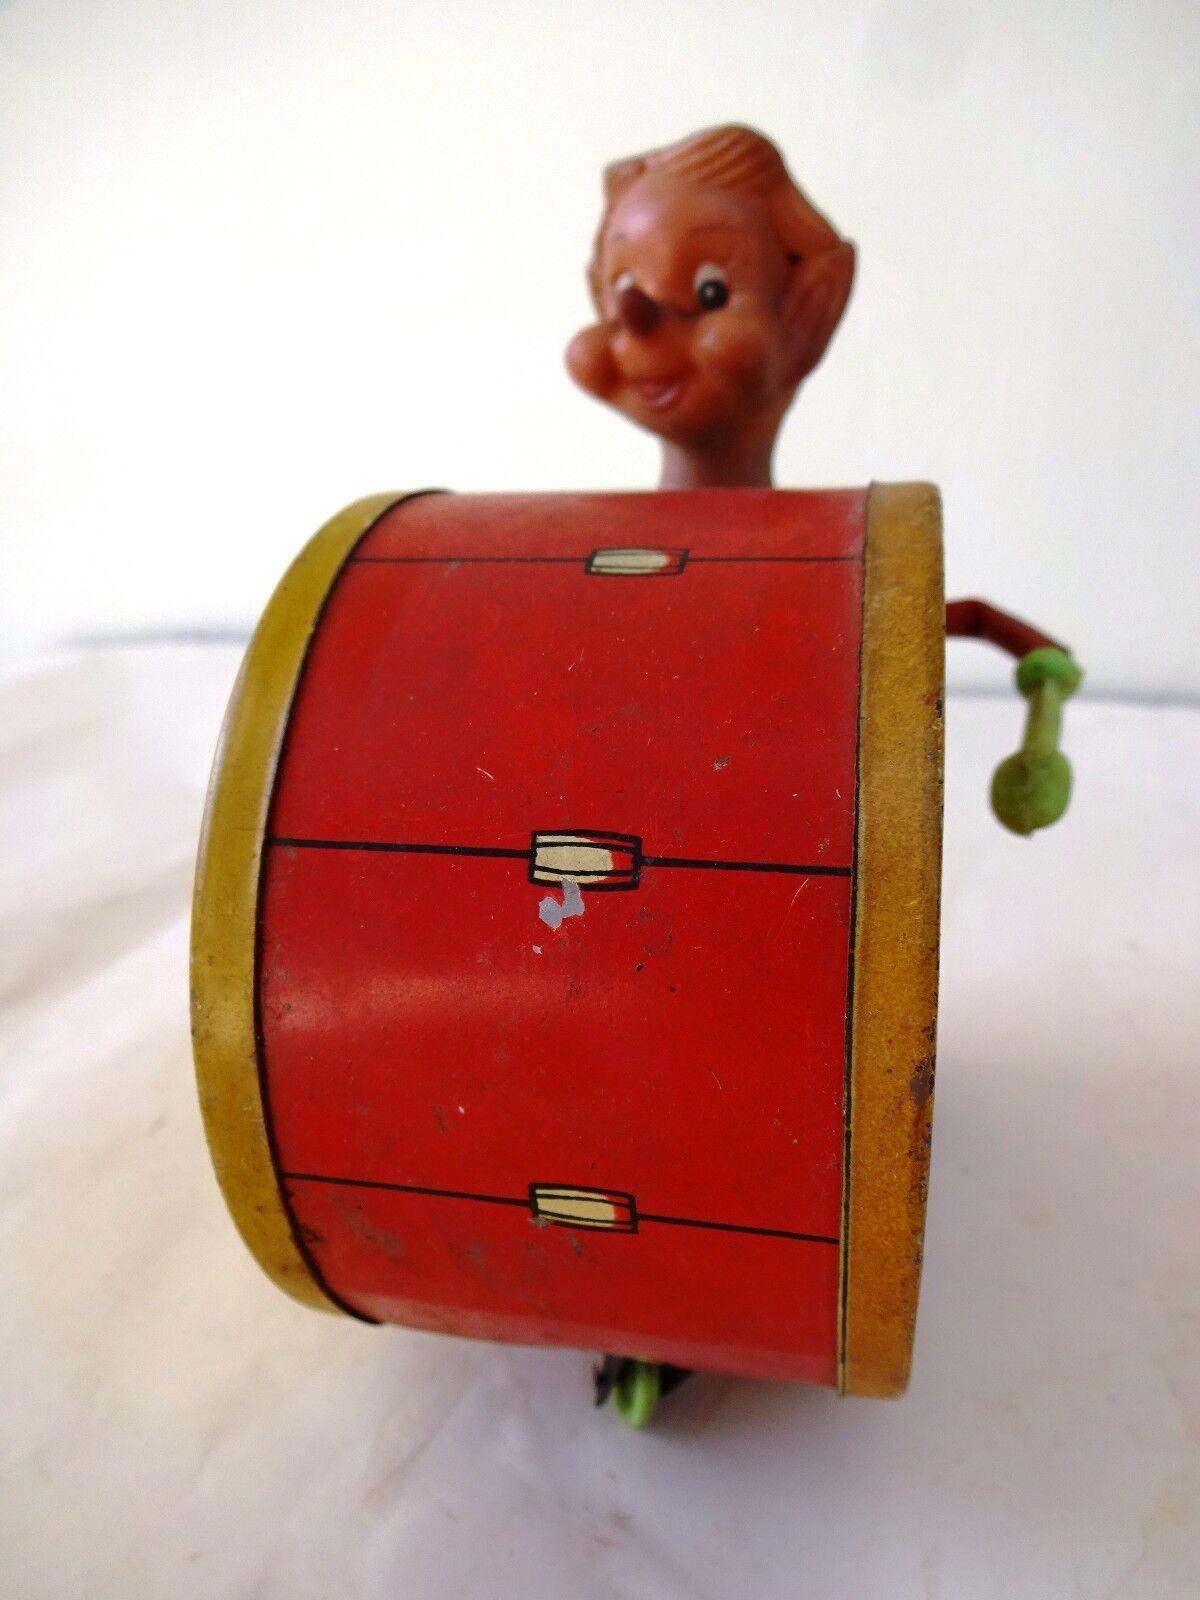 AnBindenke Tin speelgoed Litho Wind Up Circus Raja Speelgoed CLaagn Joker Drummer CollecBindenf